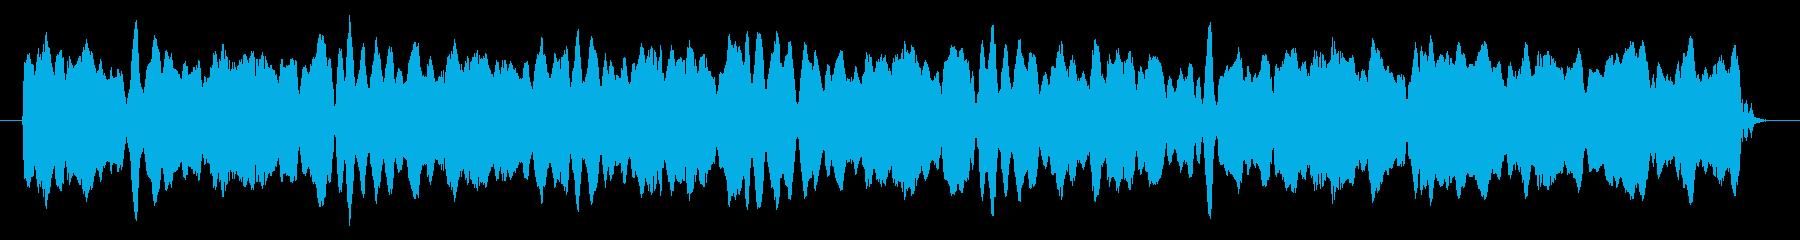 8bitパワーU-D-02-3_dryの再生済みの波形